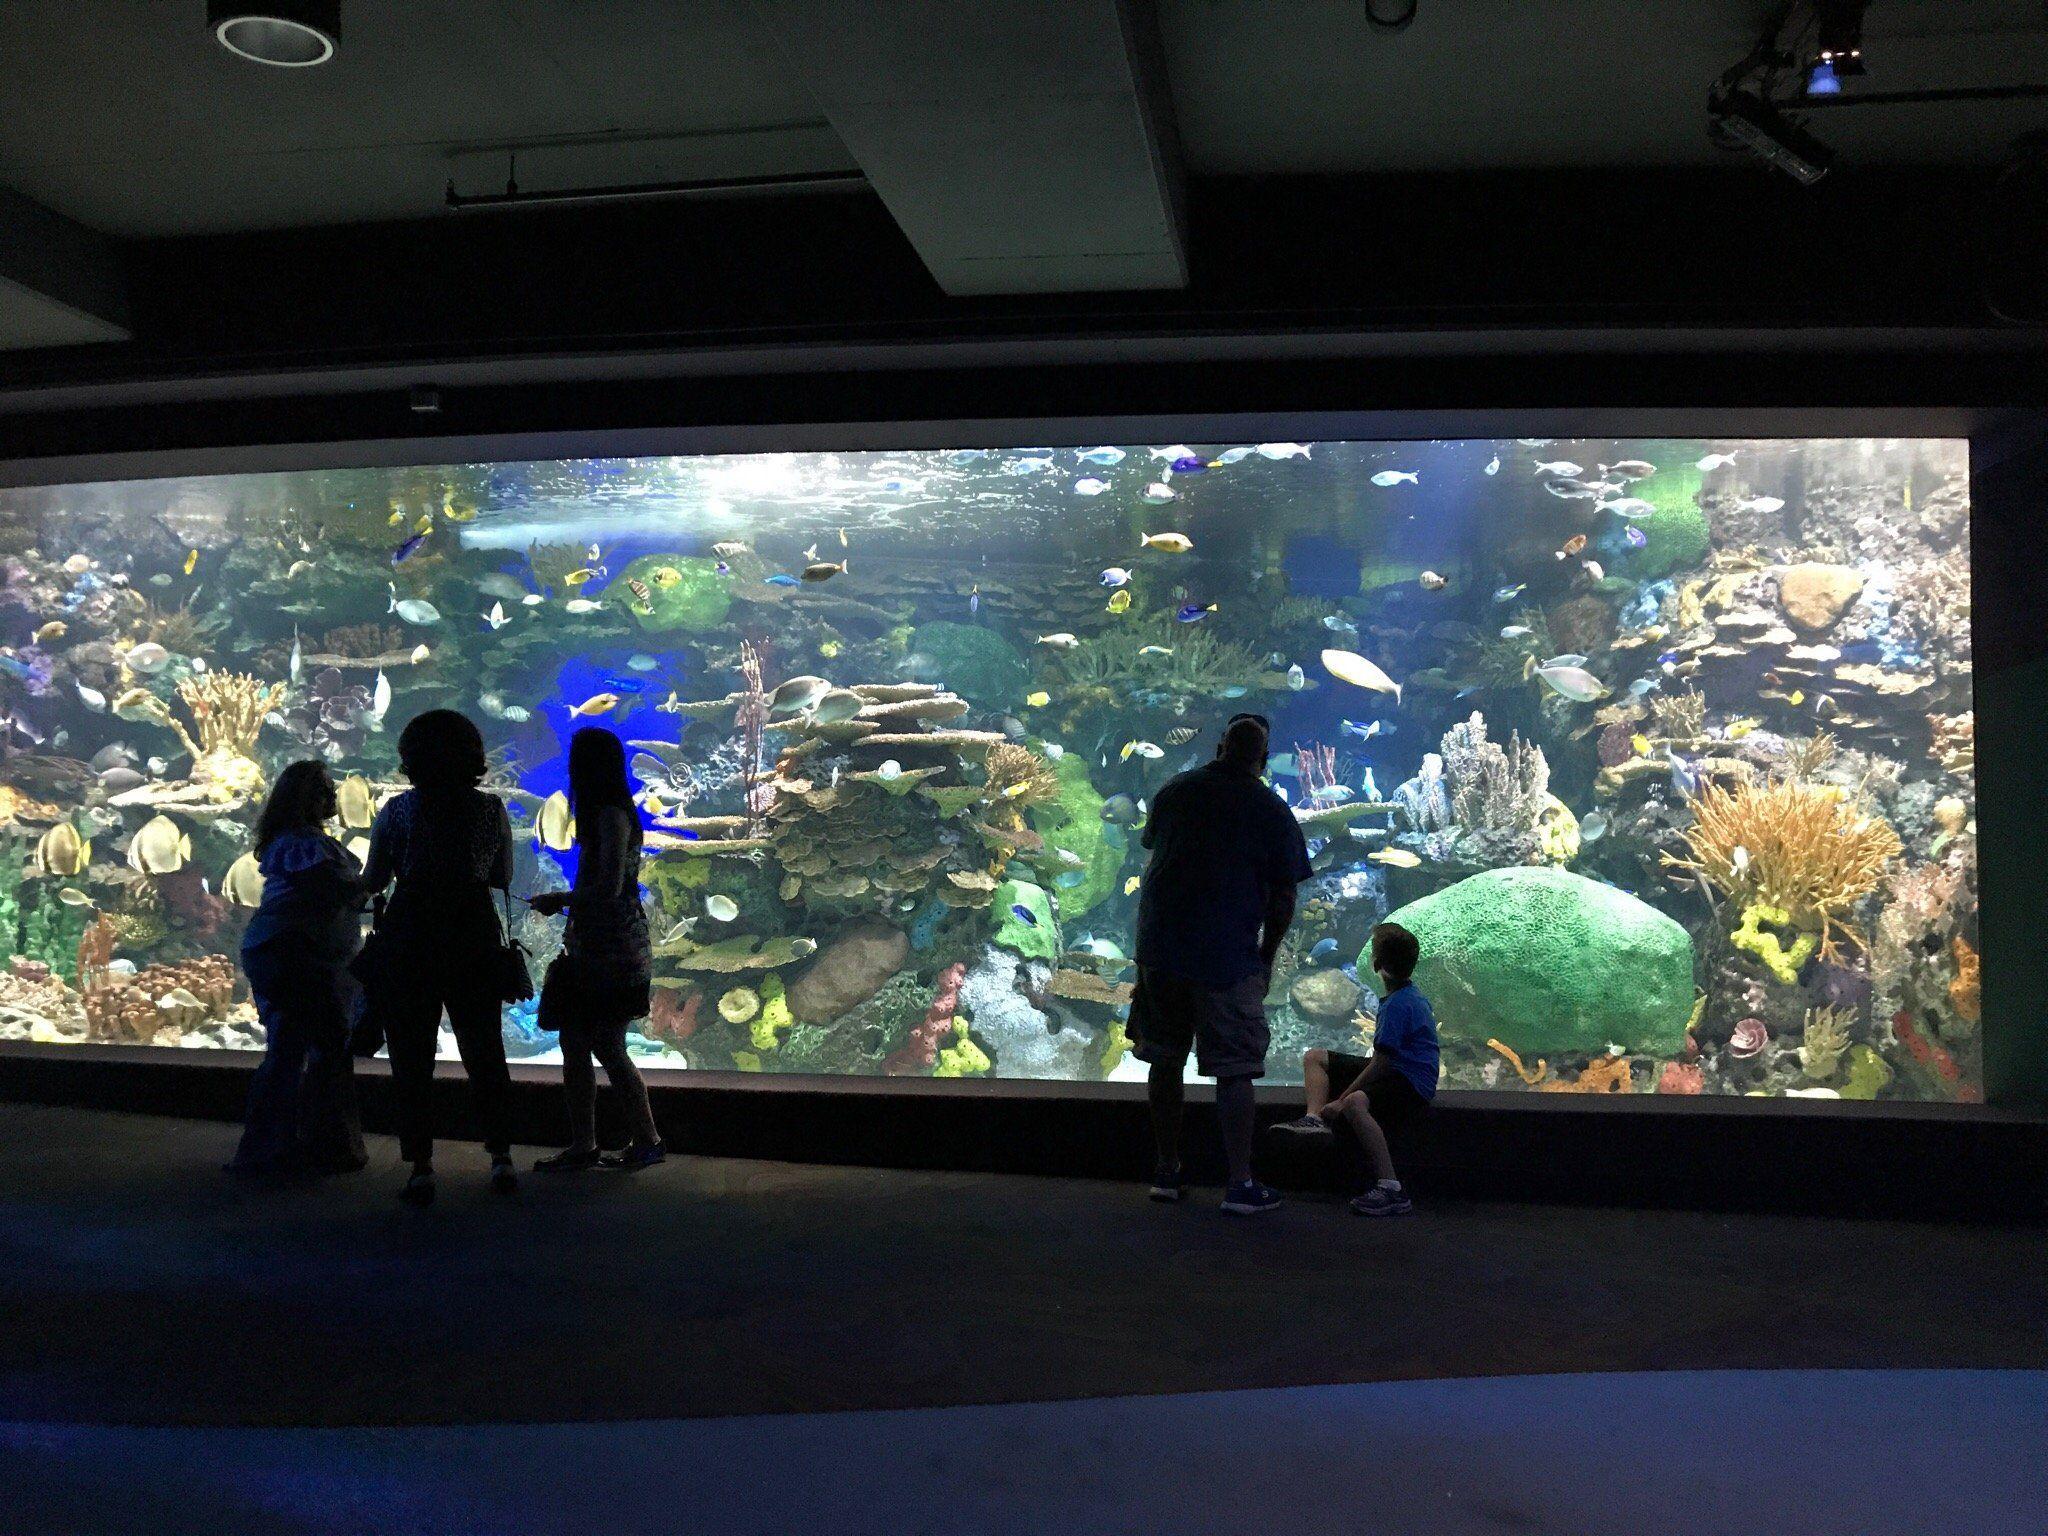 Ripley's Aquarium Of Canada (Toronto) - All You Need to ...